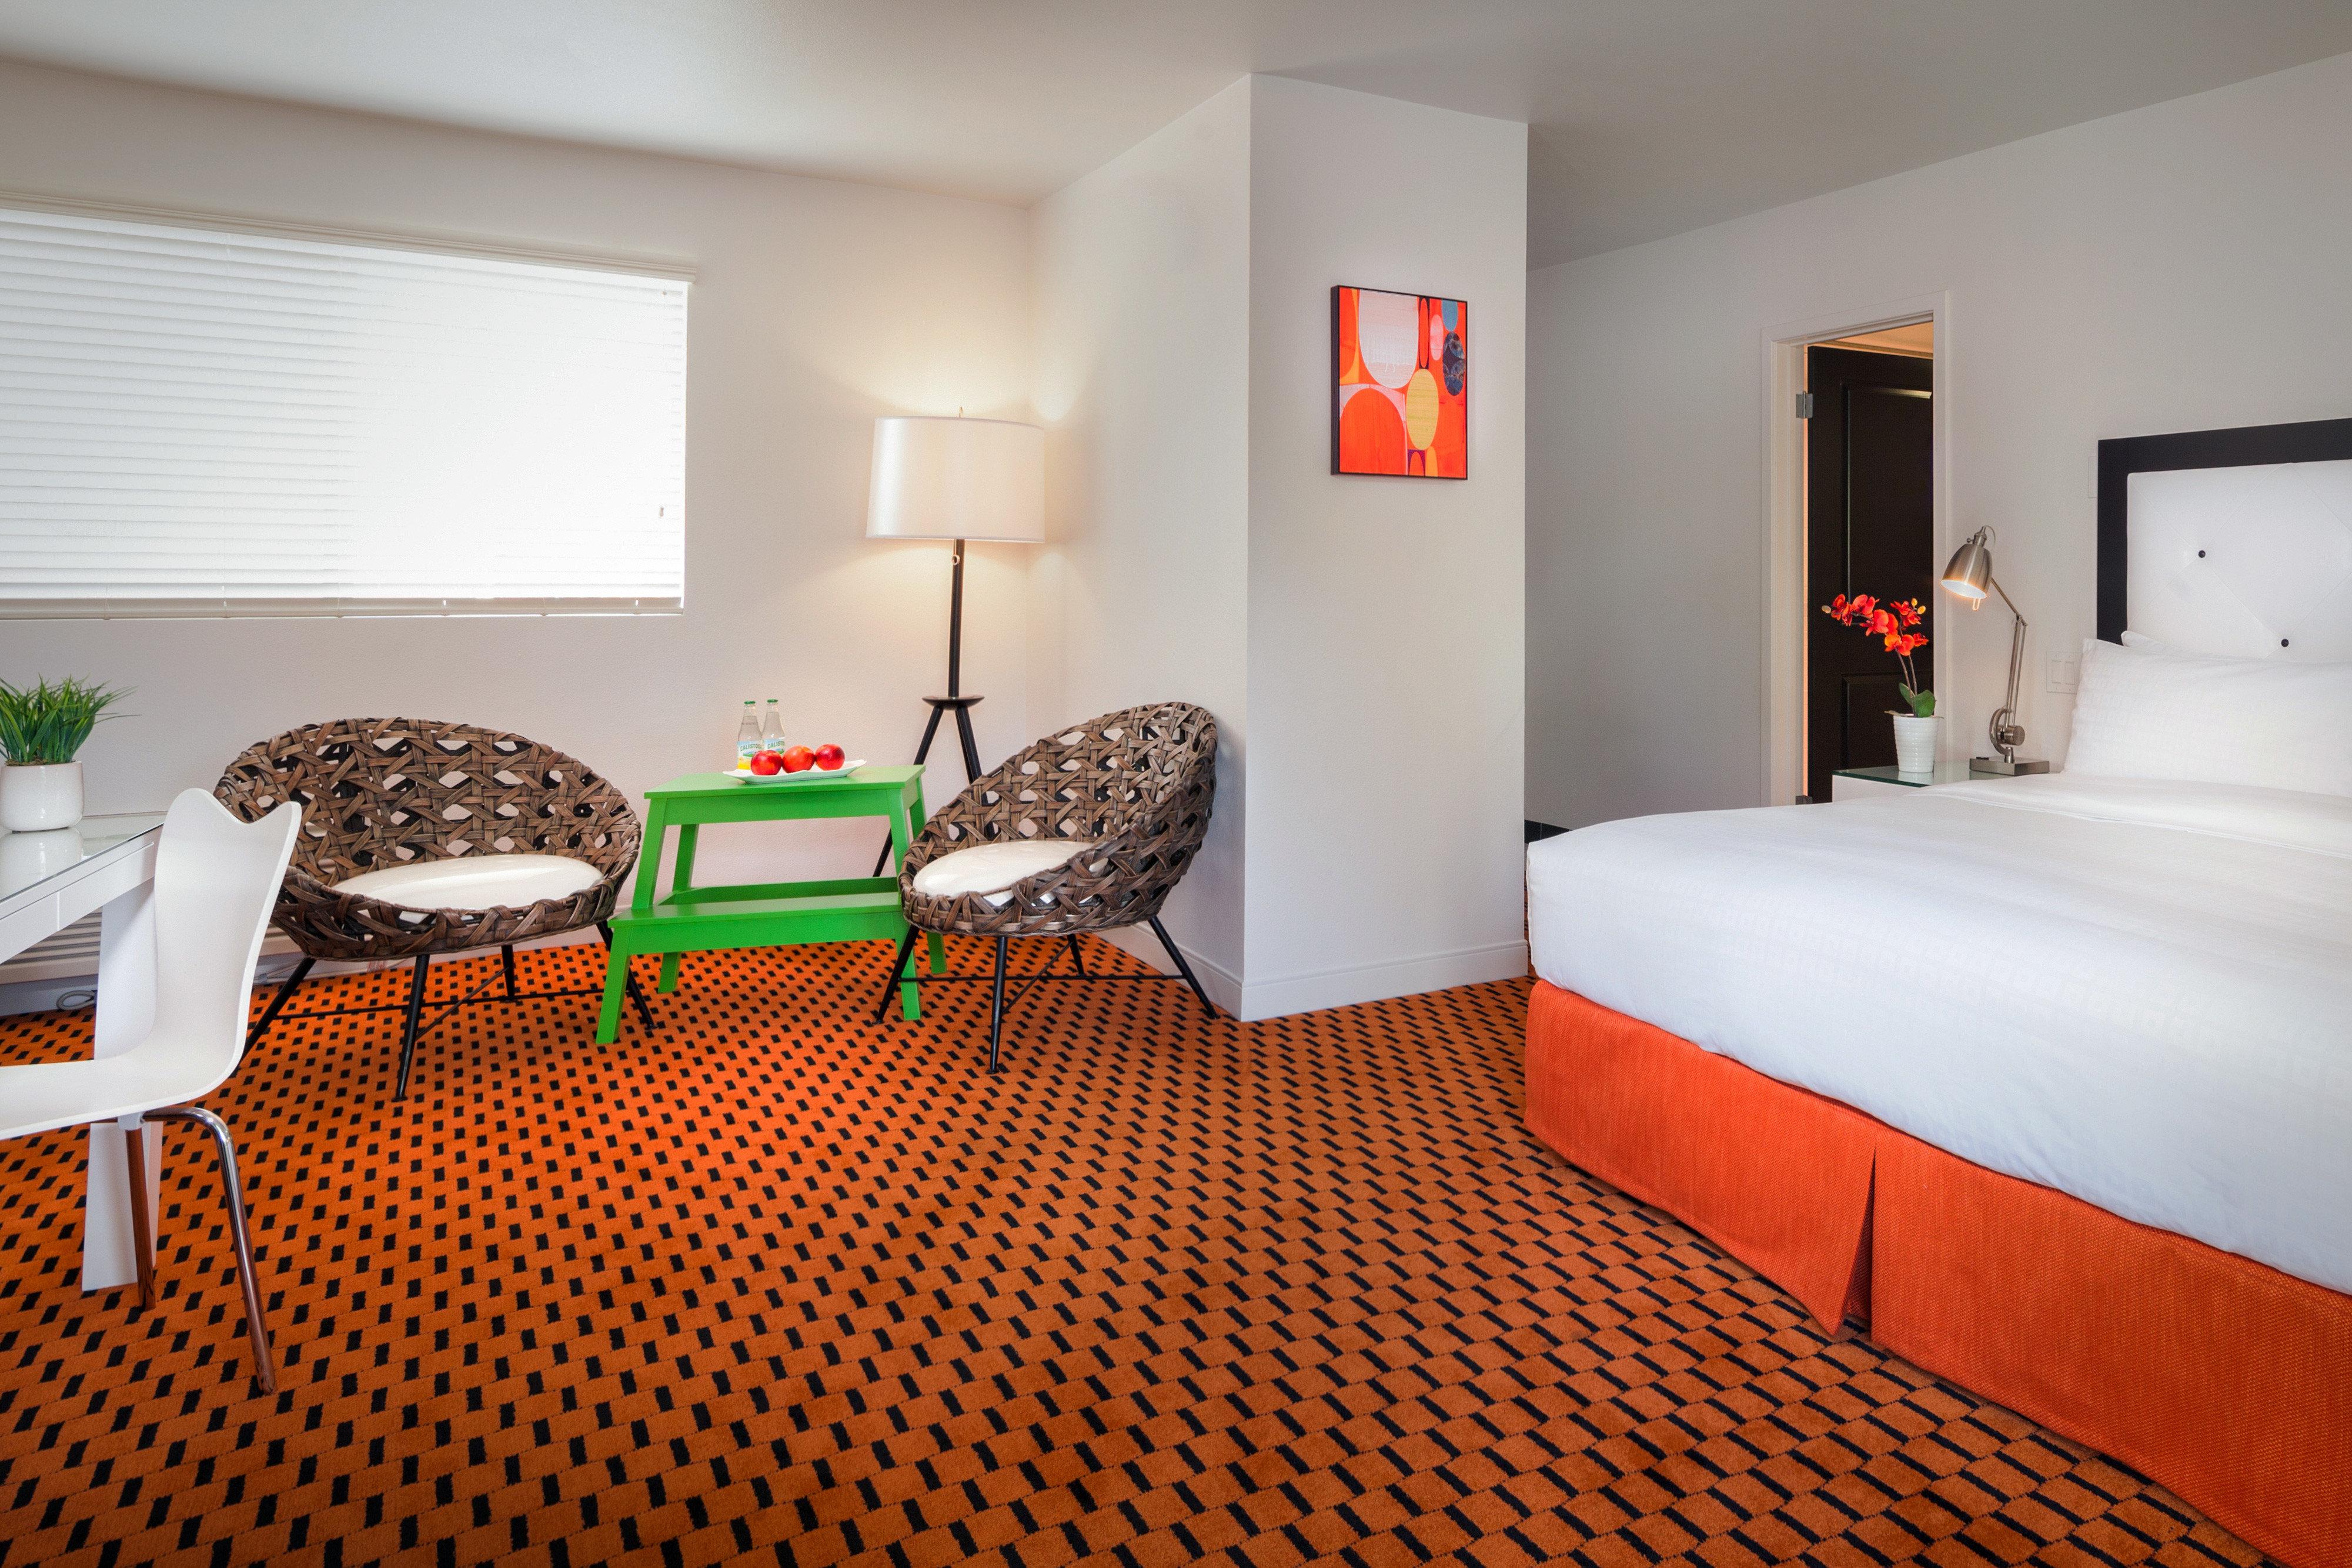 Bedroom Lounge Modern chair property red Suite cottage orange